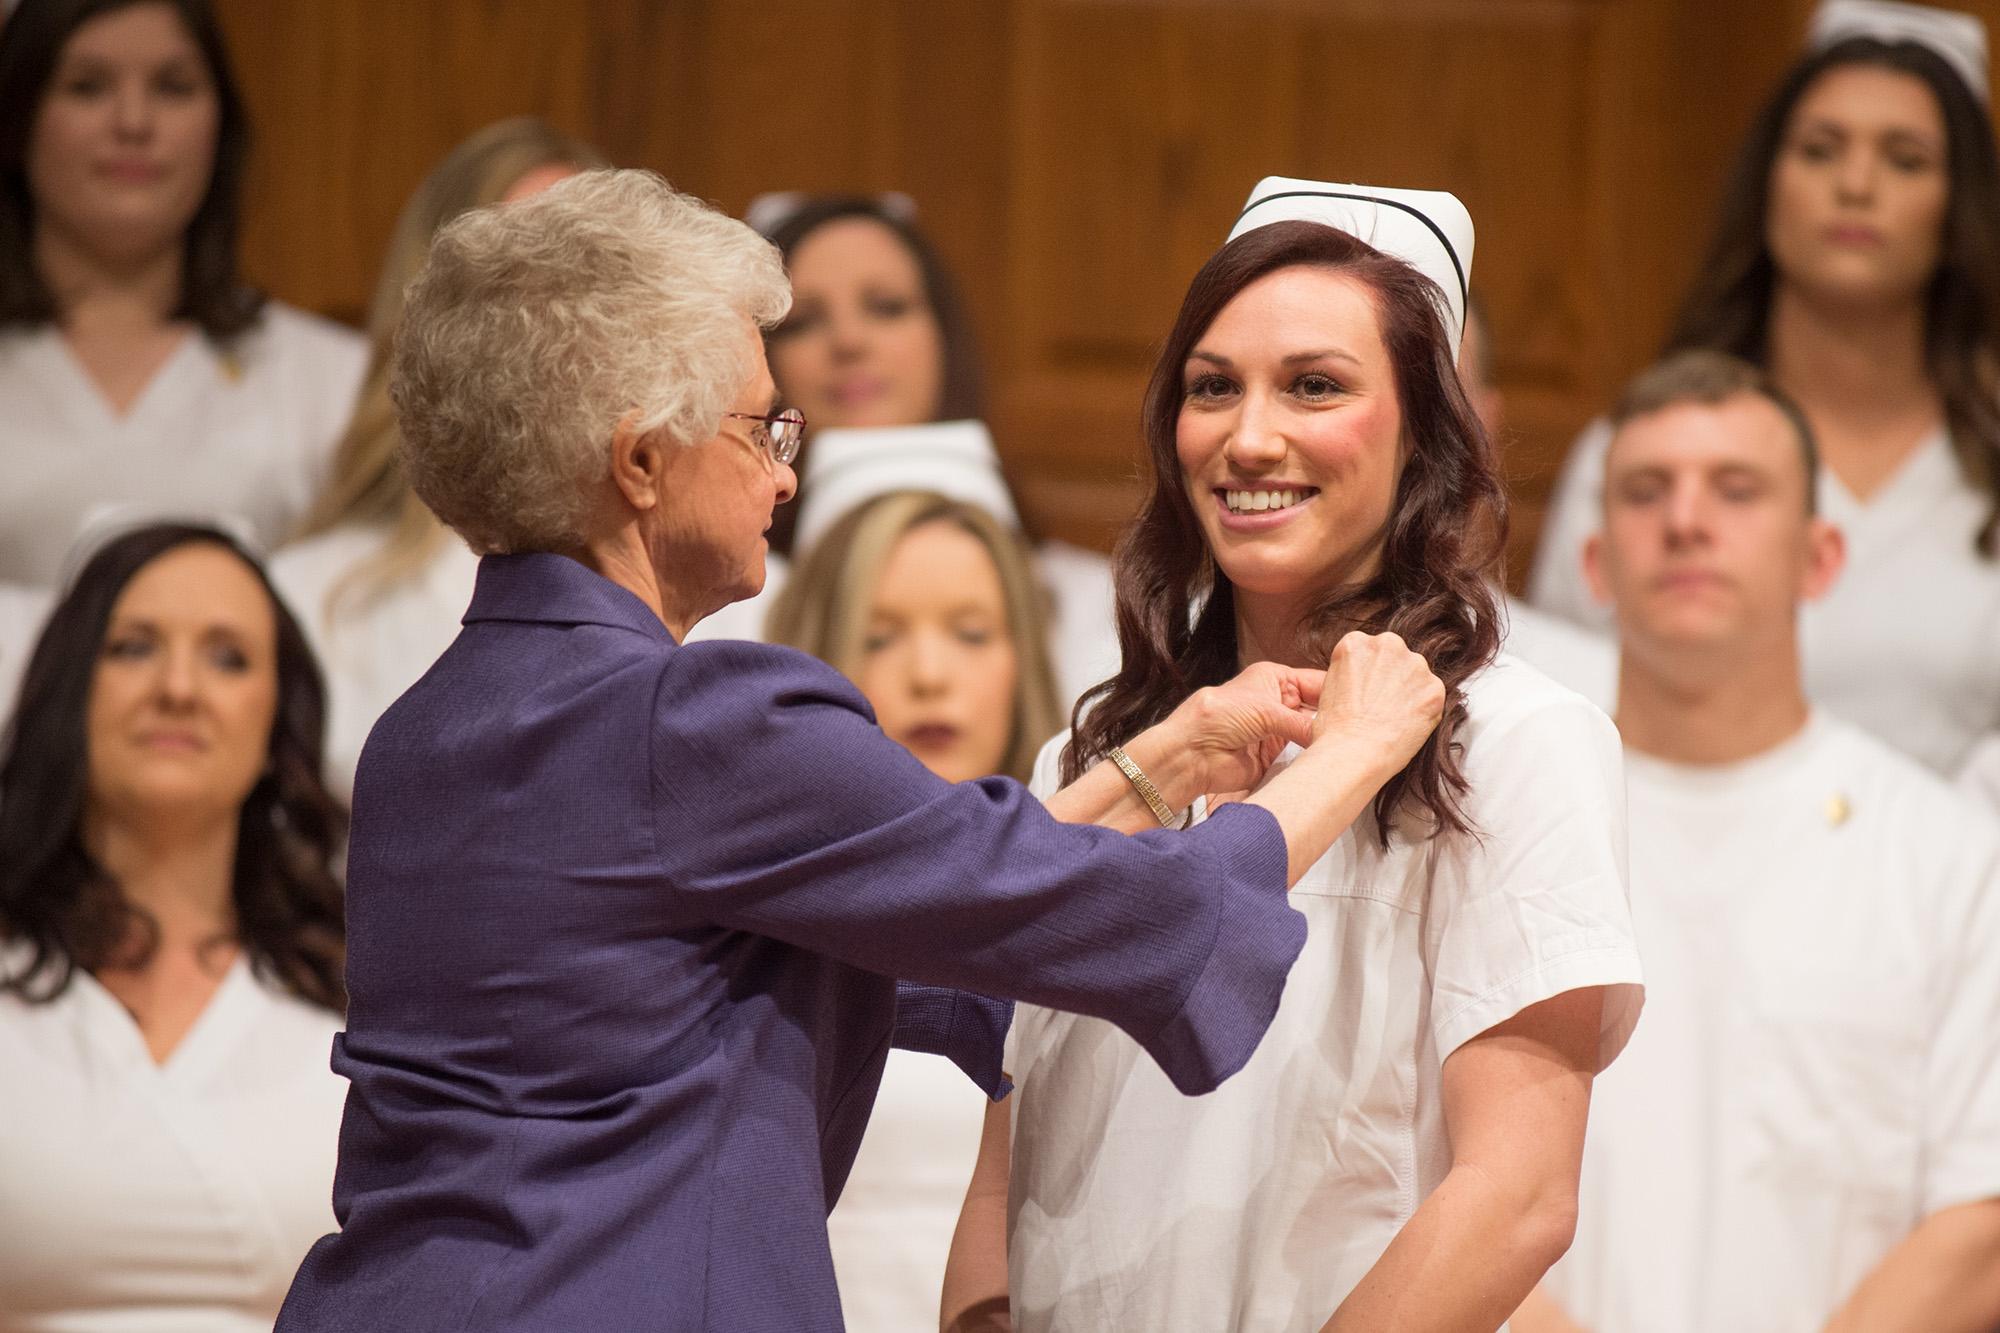 Maelyn Loch '16 (Wichita, Kan.) receives her nursing pin from instructor Joyce Huber during the 49th Nursing Pinning Ceremony.